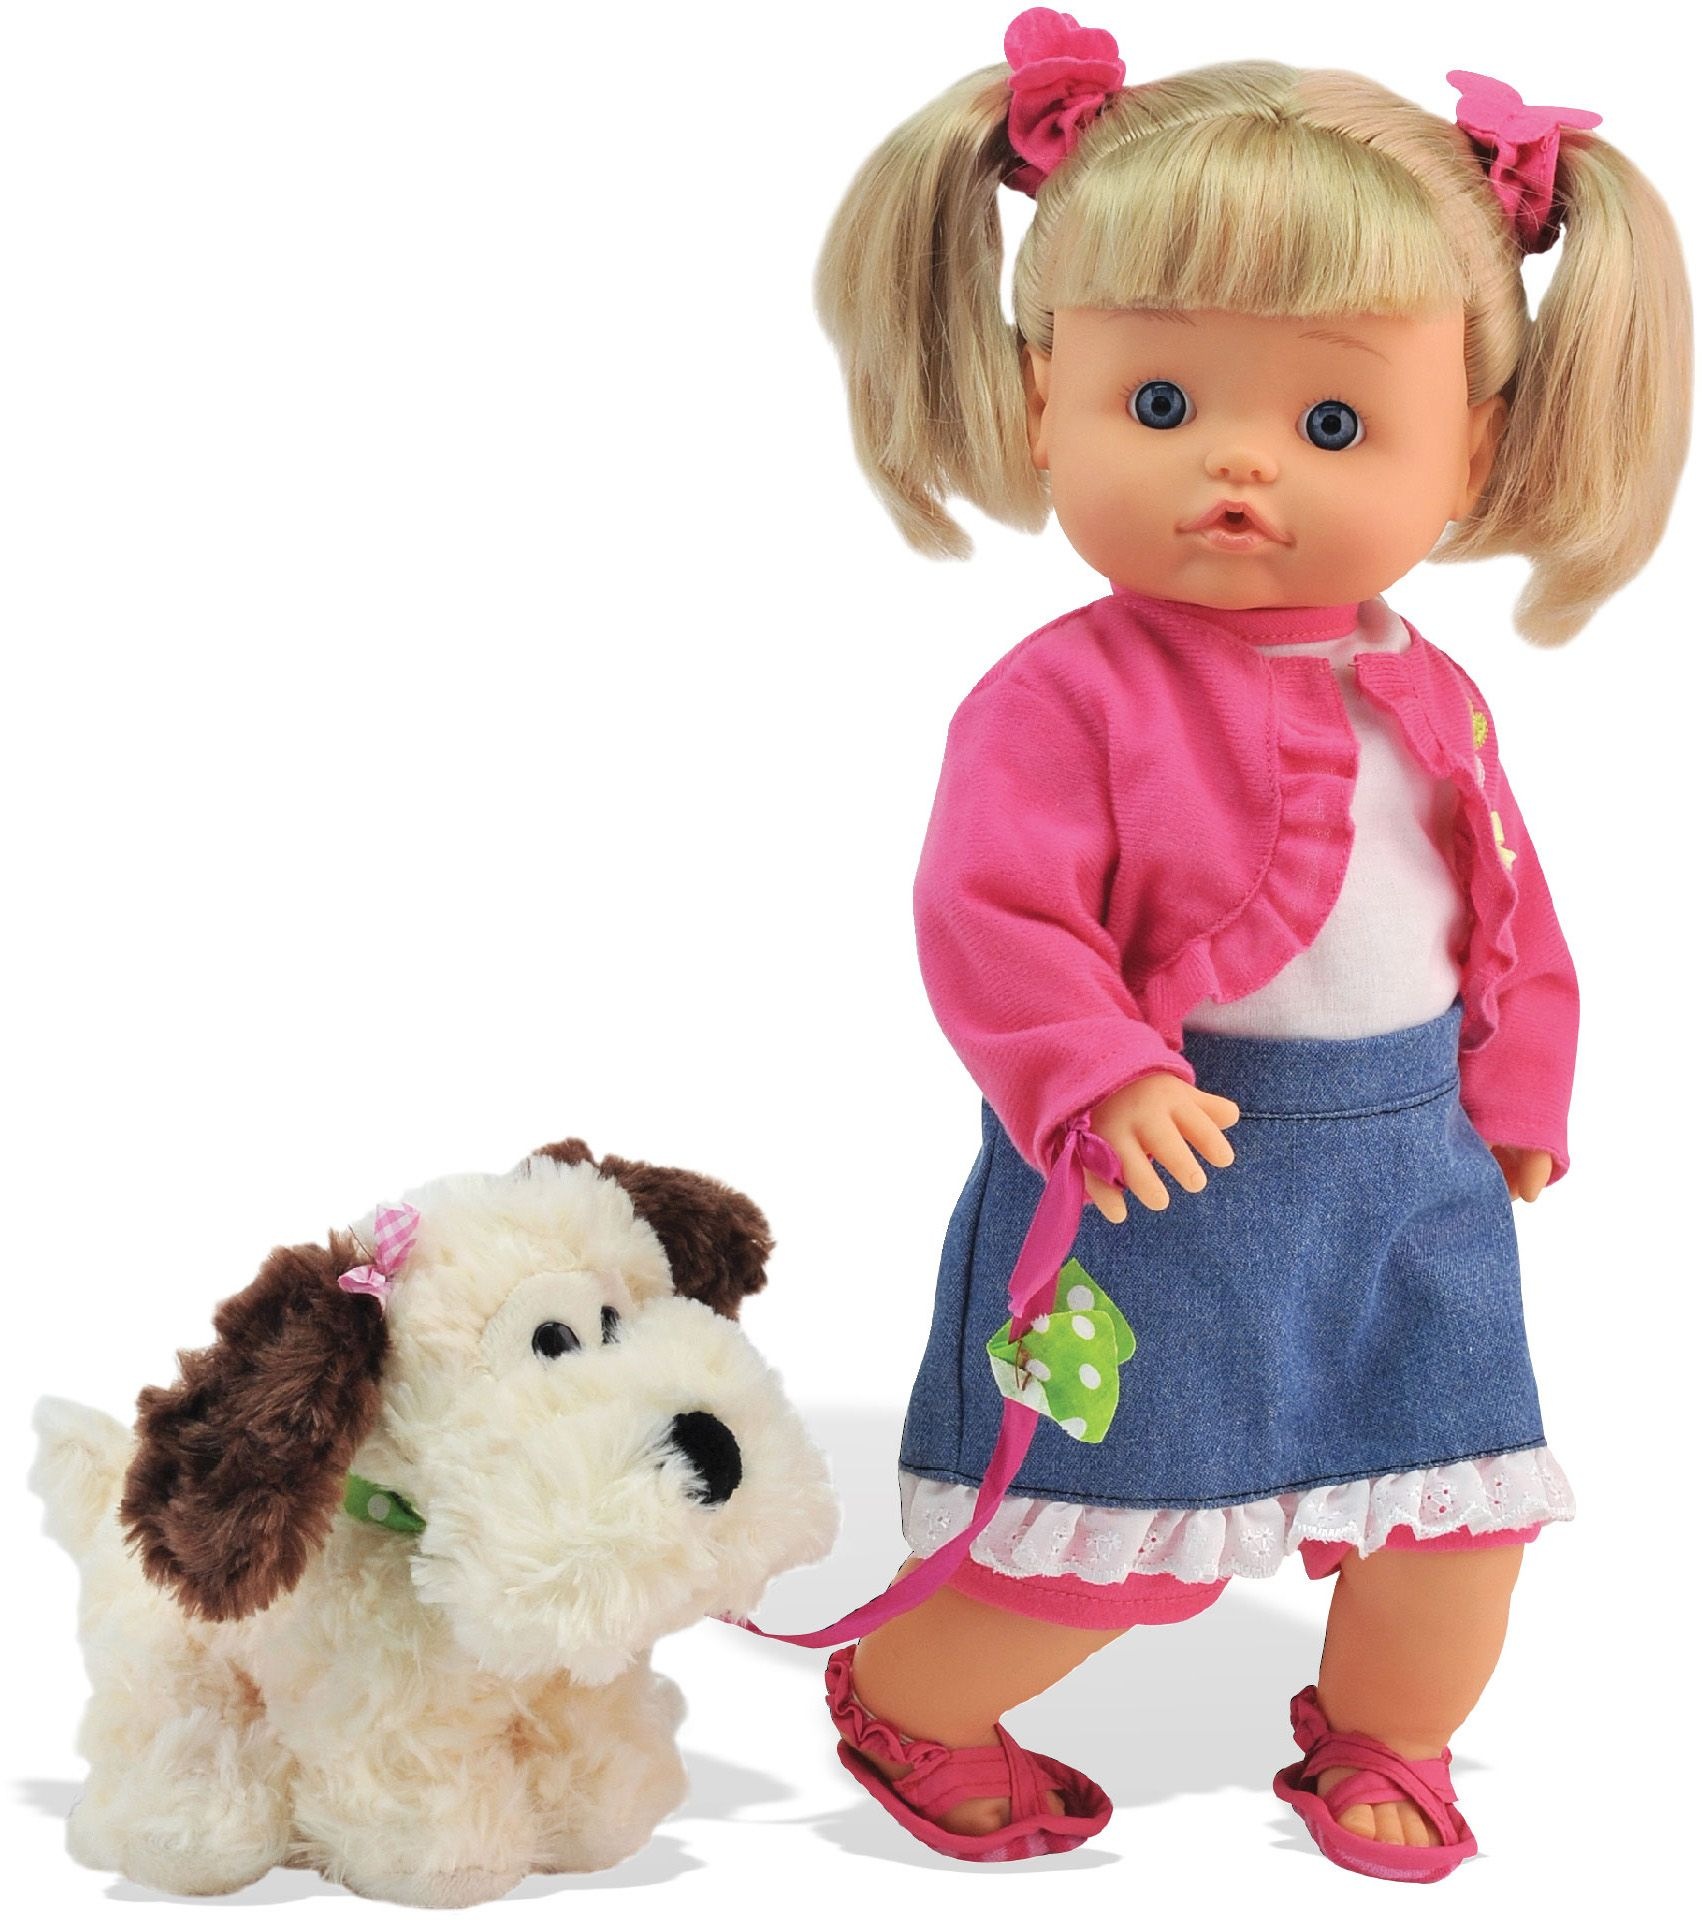 DIMIAN Dimian Puppe mit Stofftier Hund, »Bambolina Nena Pipì Popò Puppe«